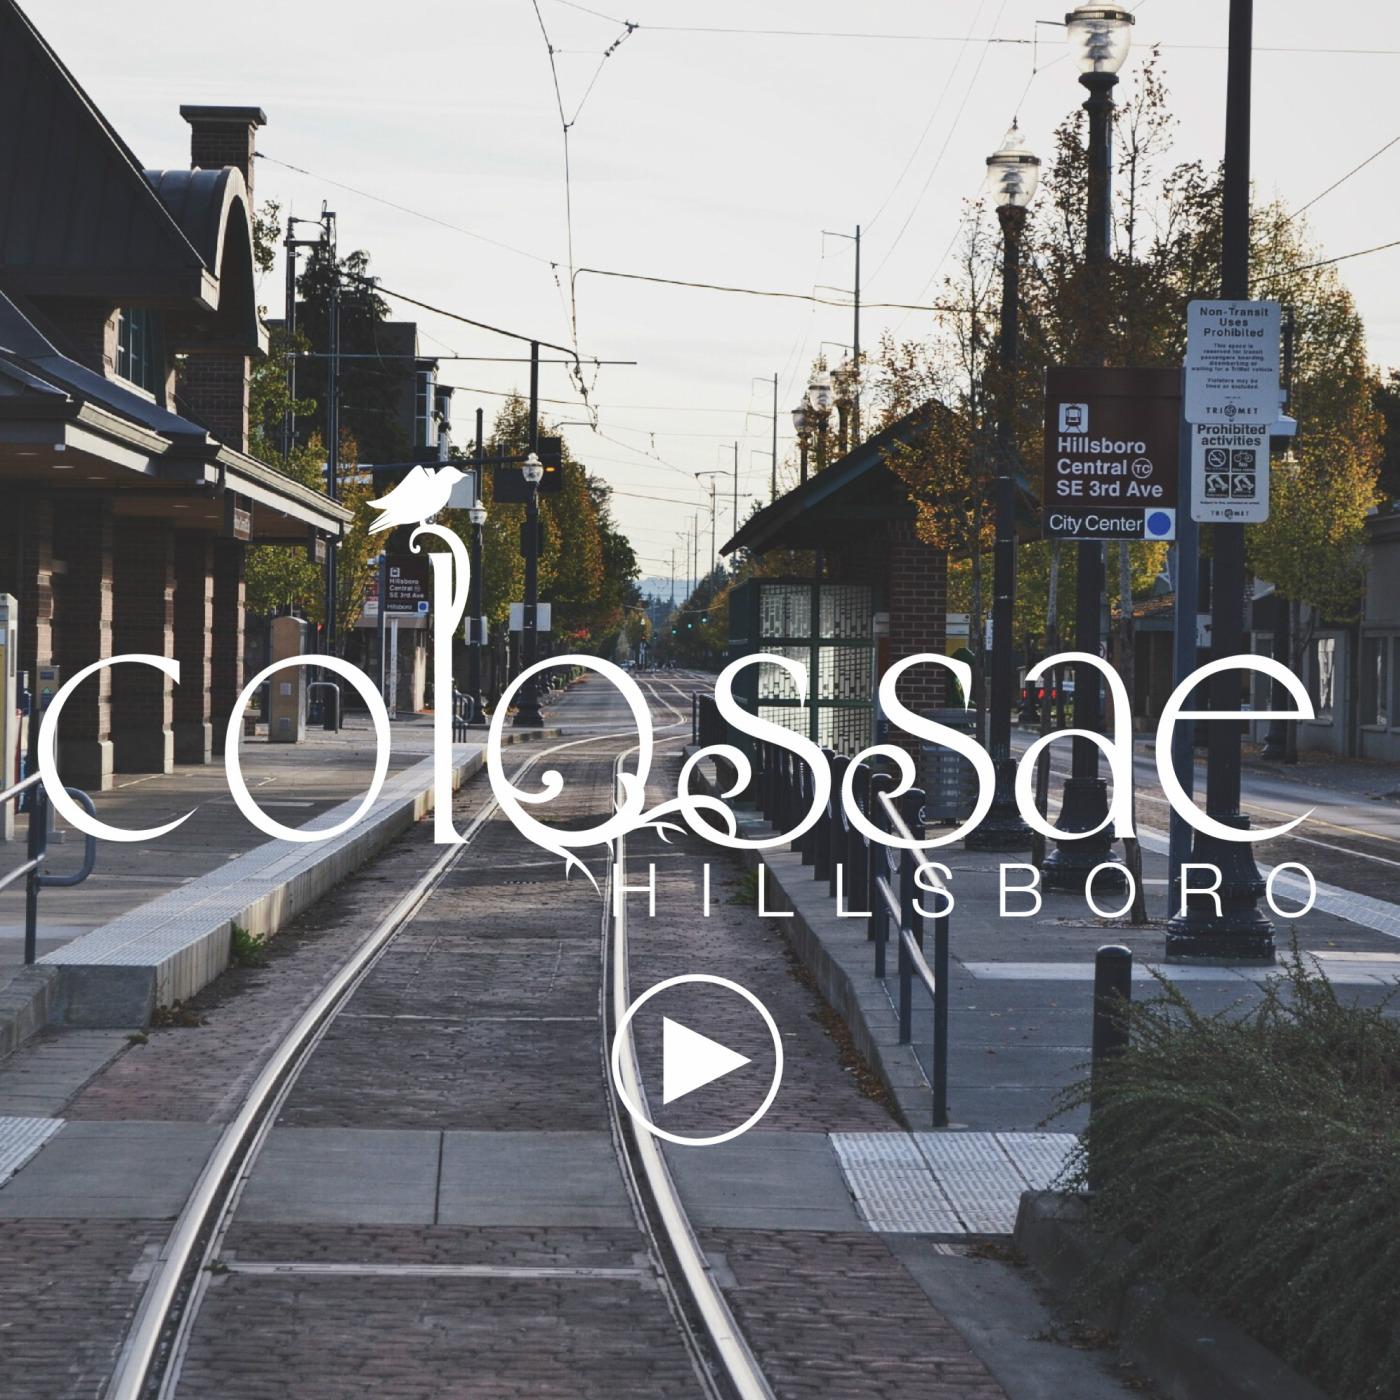 Colossae Hillsboro